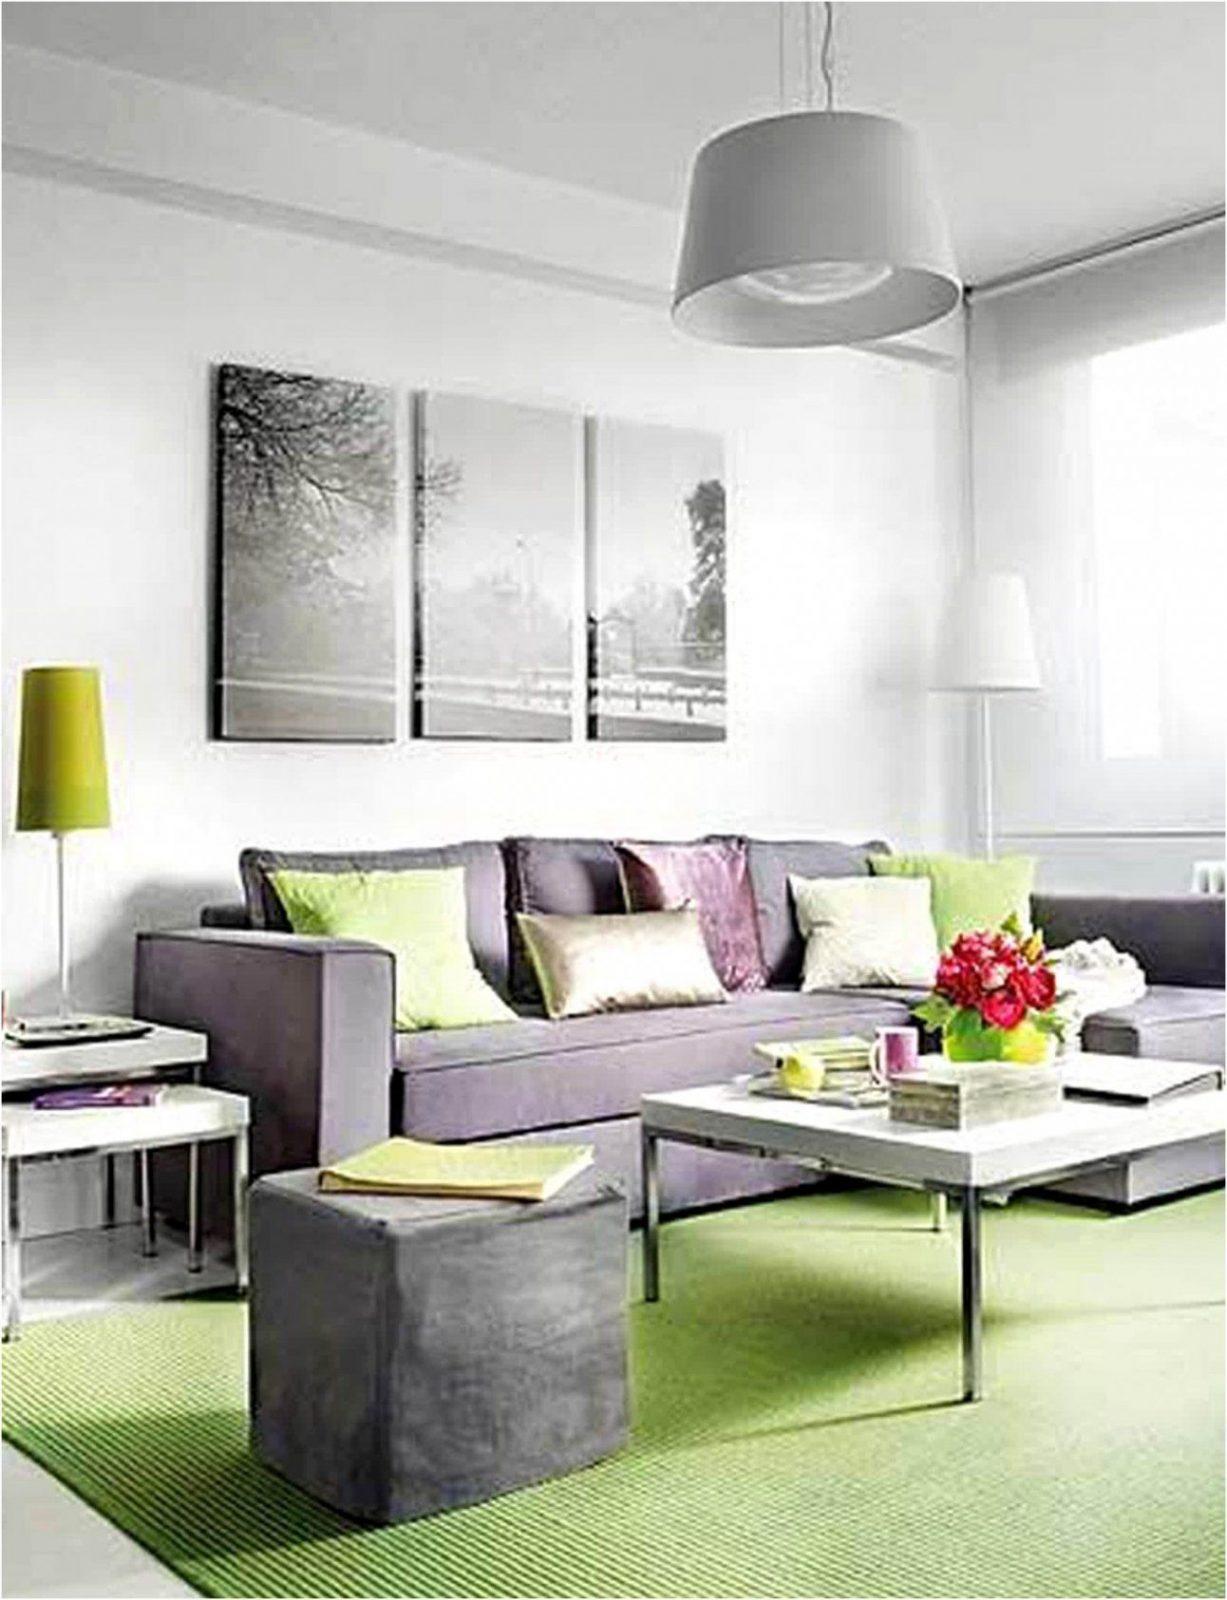 Genial Wandbilder Fürs Wohnzimmer Ta Y Ta Y Für Grosse Bilder Fürs von Grosse Bilder Fürs Wohnzimmer Bild